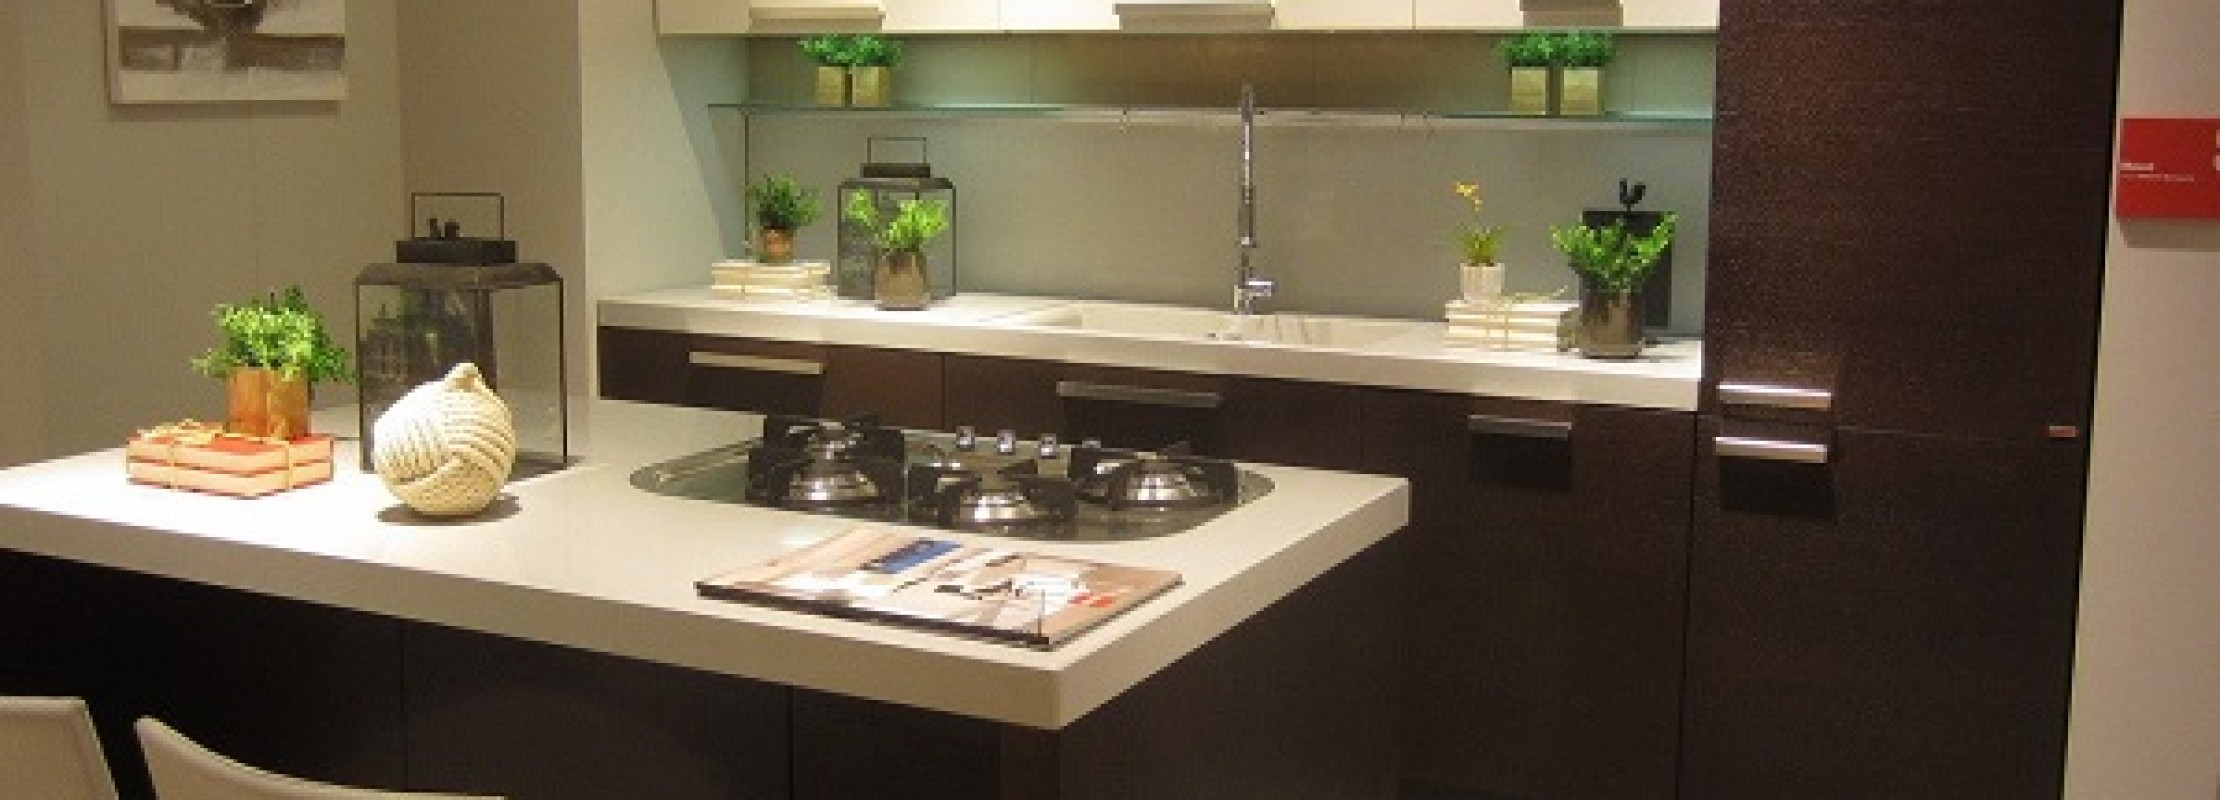 Idee Cucine Con Isola.Cucina Moderna Con Isola Idee E Consigli Blog Edilnet